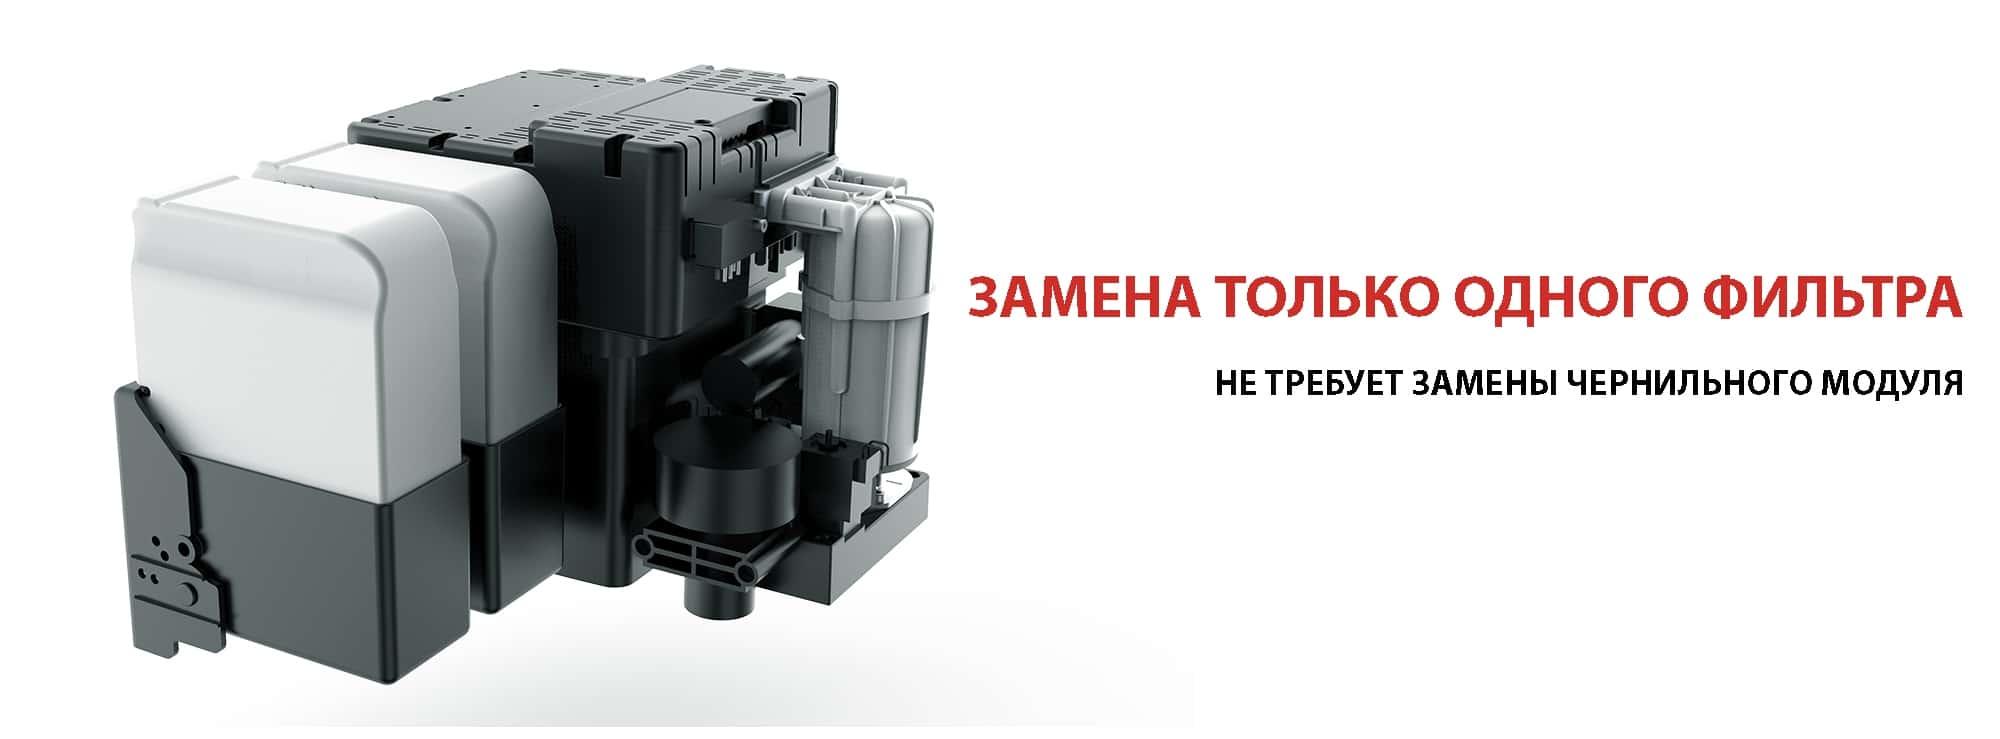 Техническое обслуживание маркиратора Fastjet F550